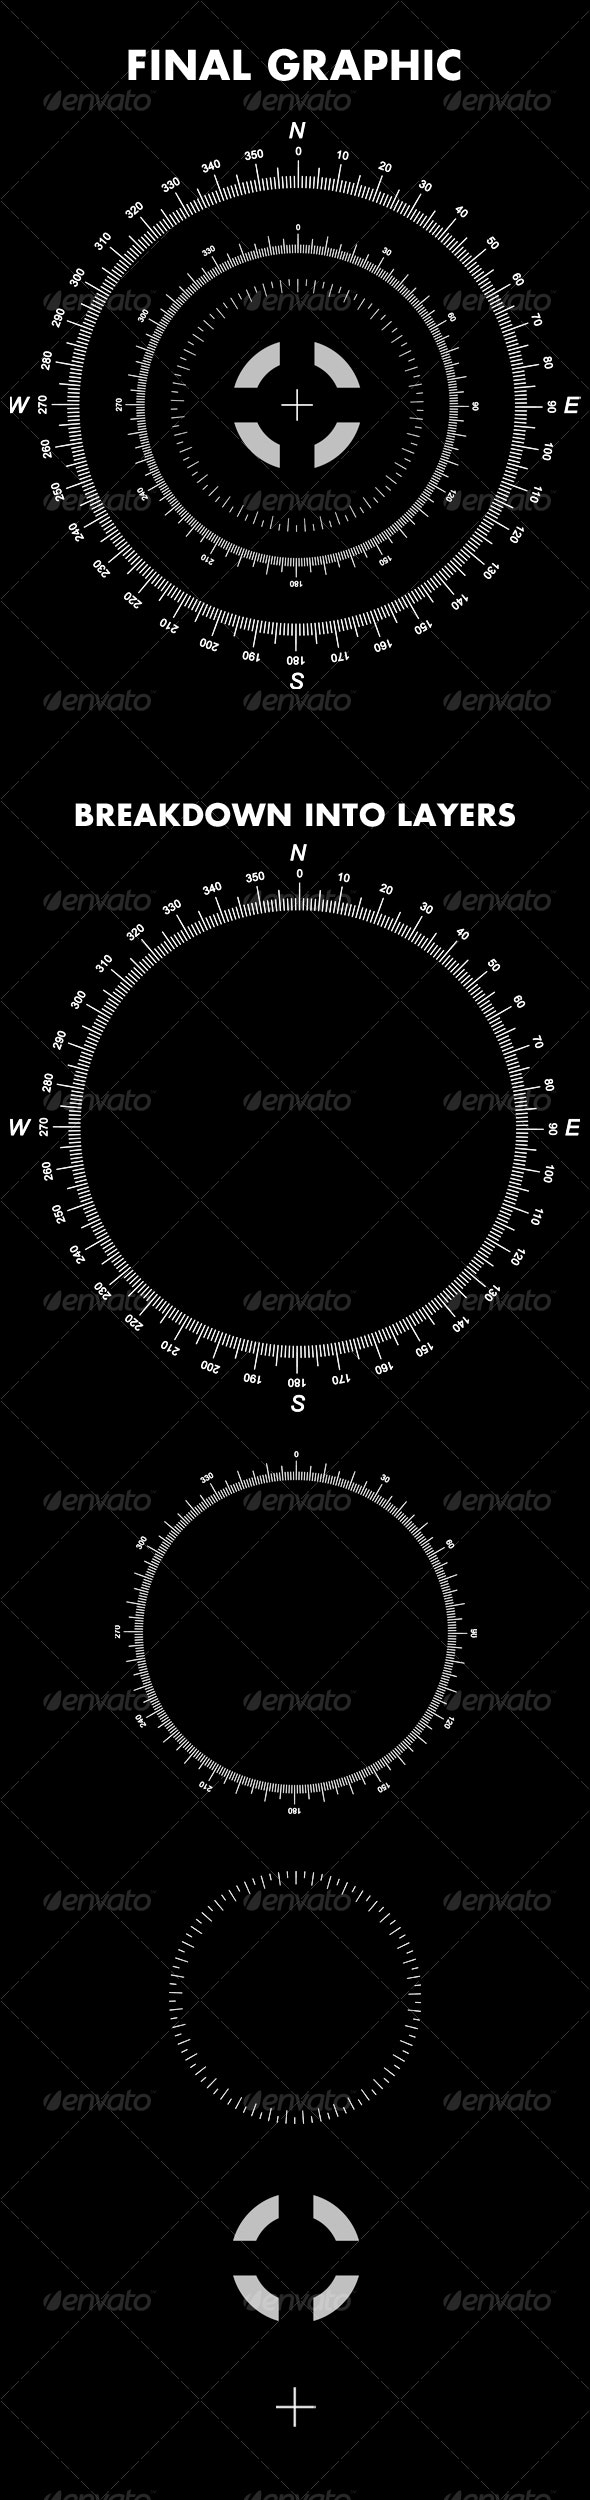 Detailed Hi Tech Compass - Layered - Tech / Futuristic Backgrounds